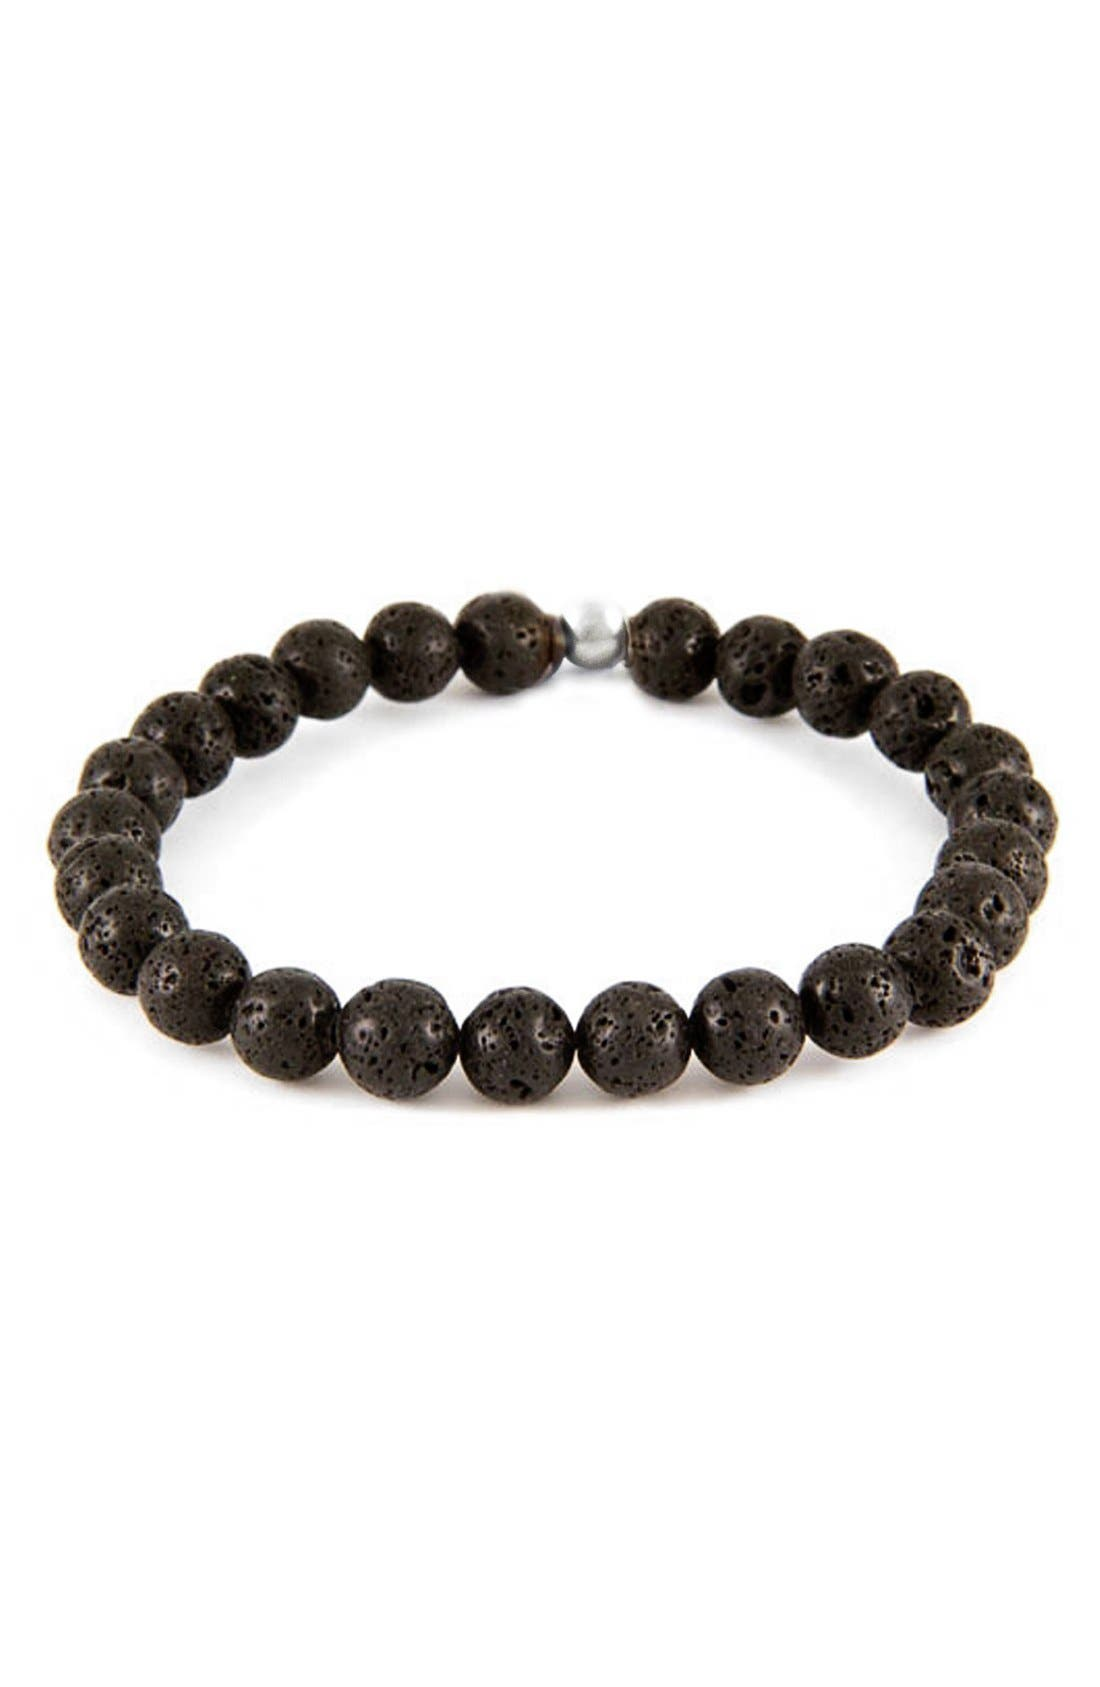 Alternate Image 1 Selected - Mr. Ettika Lava Stone Bead Bracelet